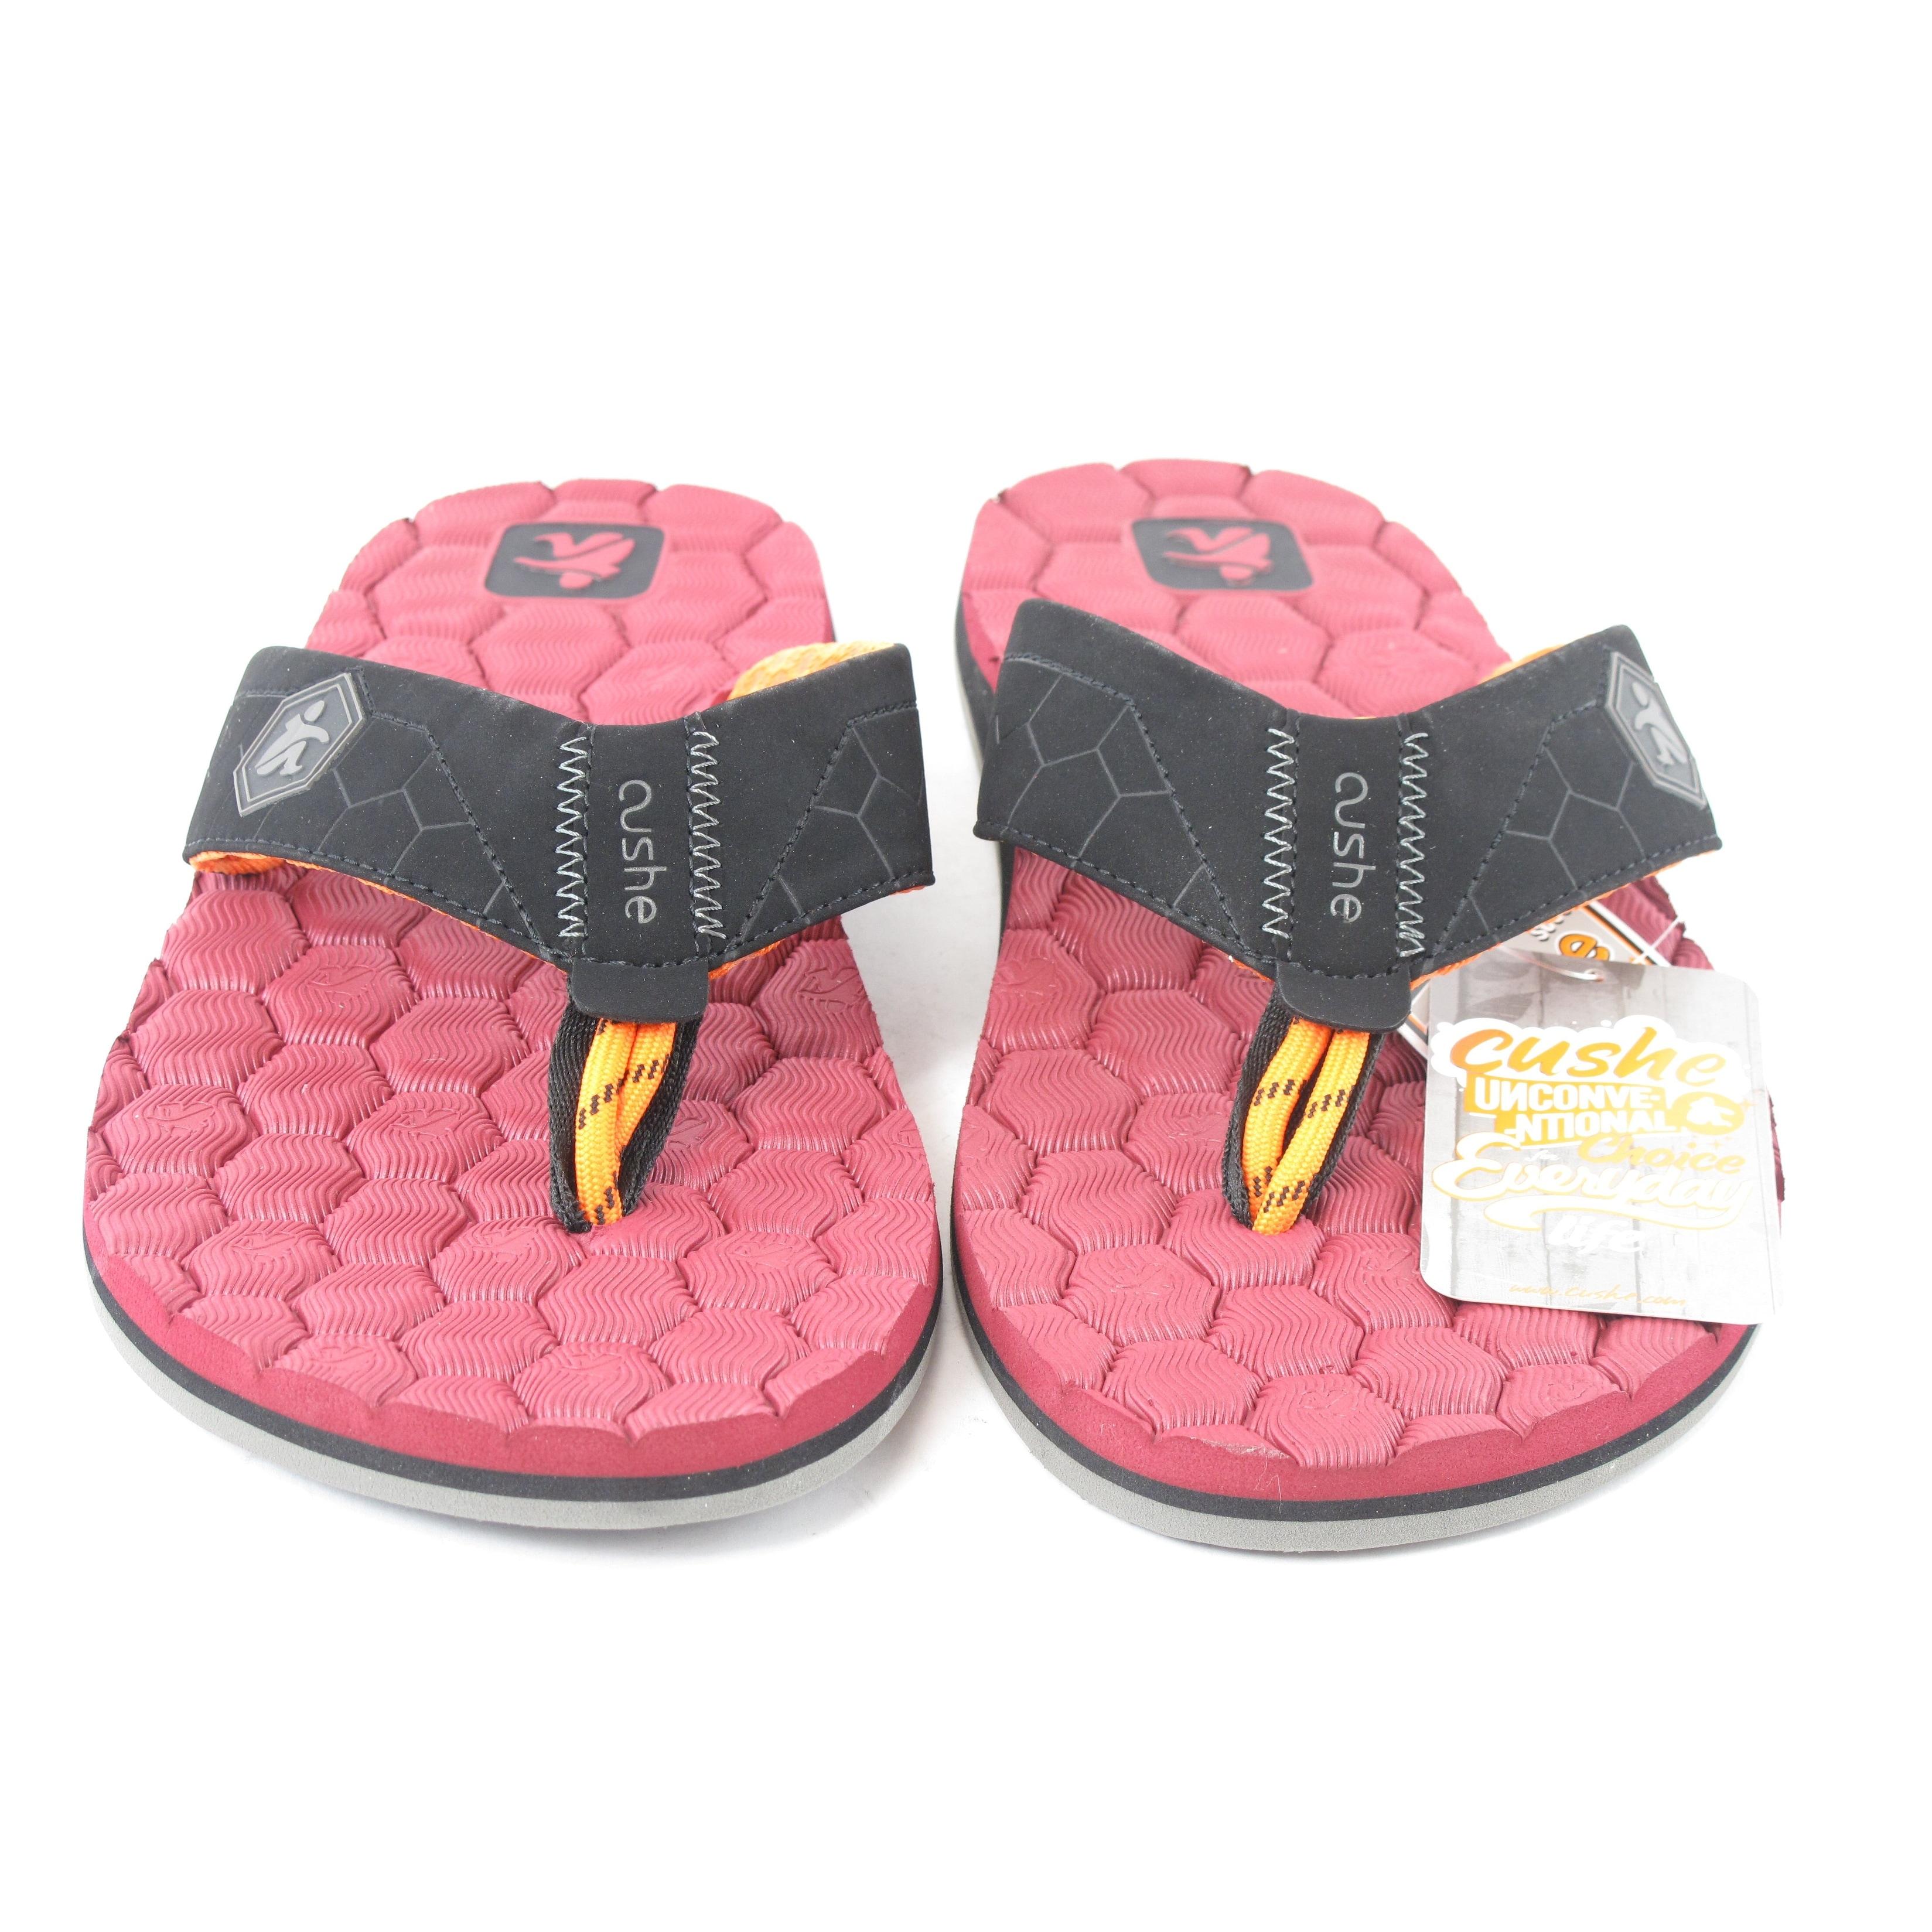 54b839769a3 Shop Cushe Mens Flipside Flip Flops - Free Shipping On Orders Over ...